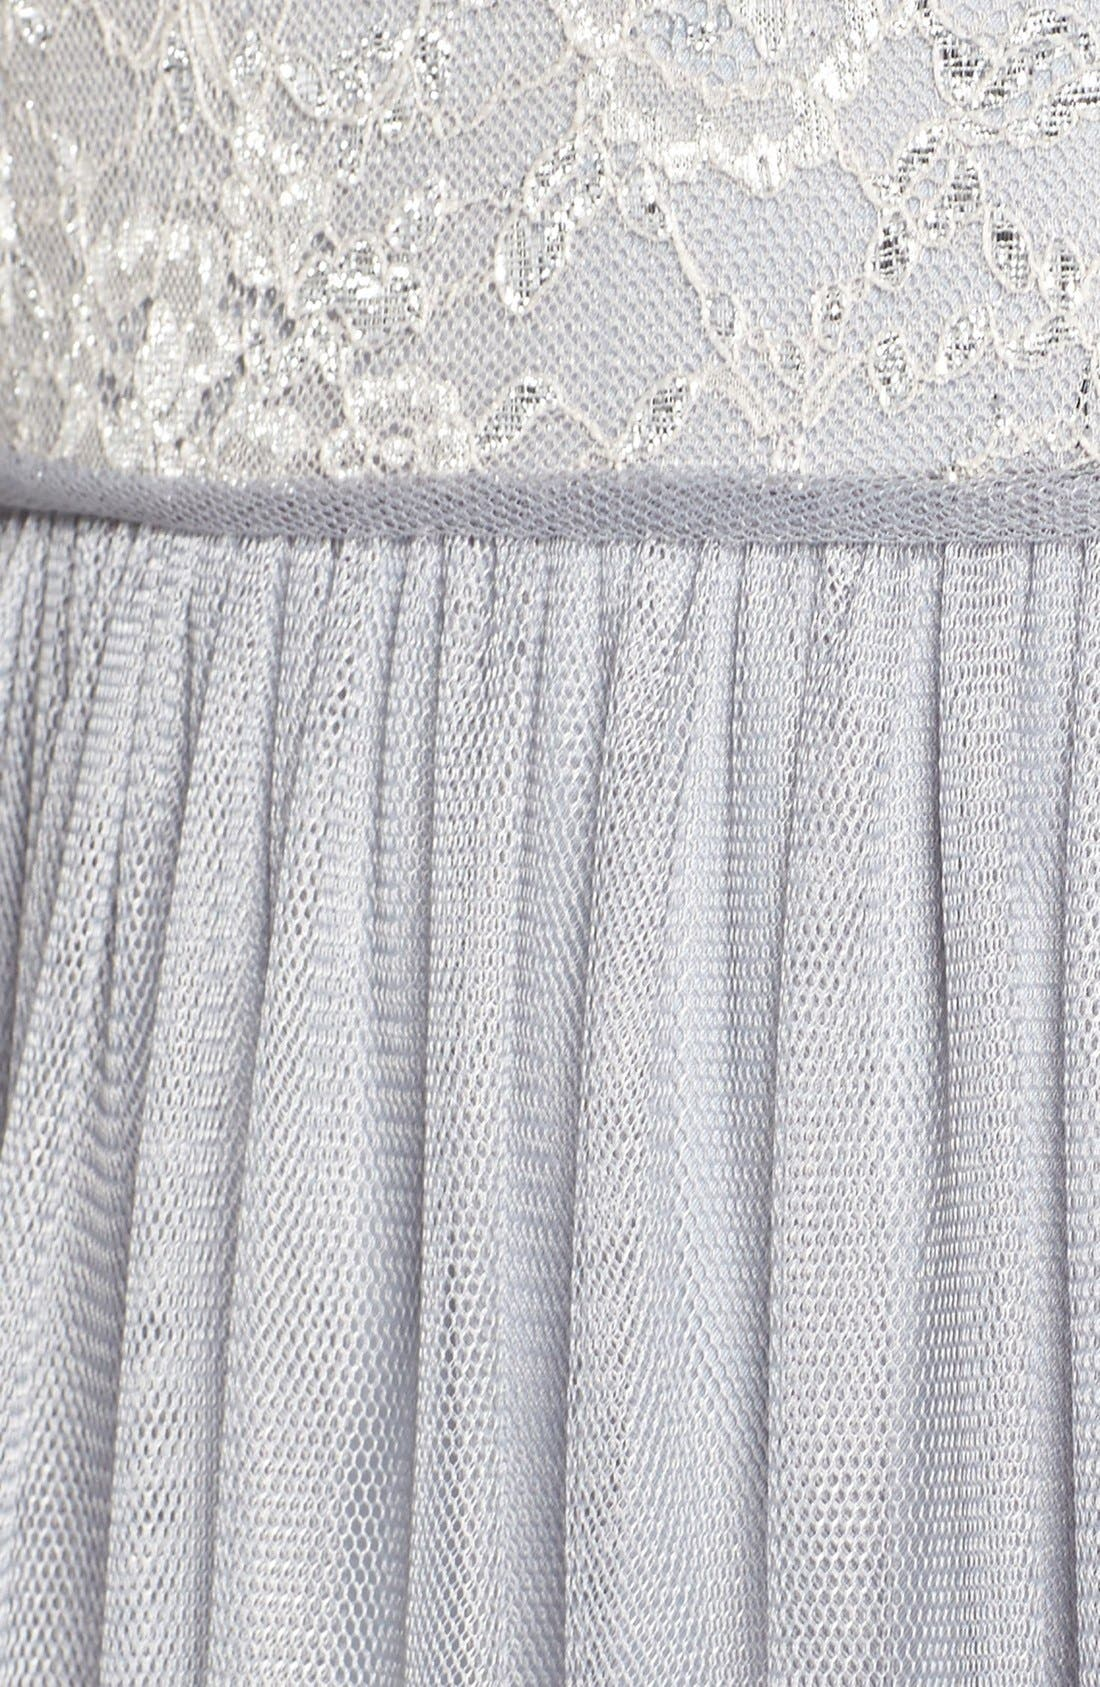 Metallic Lace & Tulle Spaghetti Strap Gown,                             Alternate thumbnail 5, color,                             040